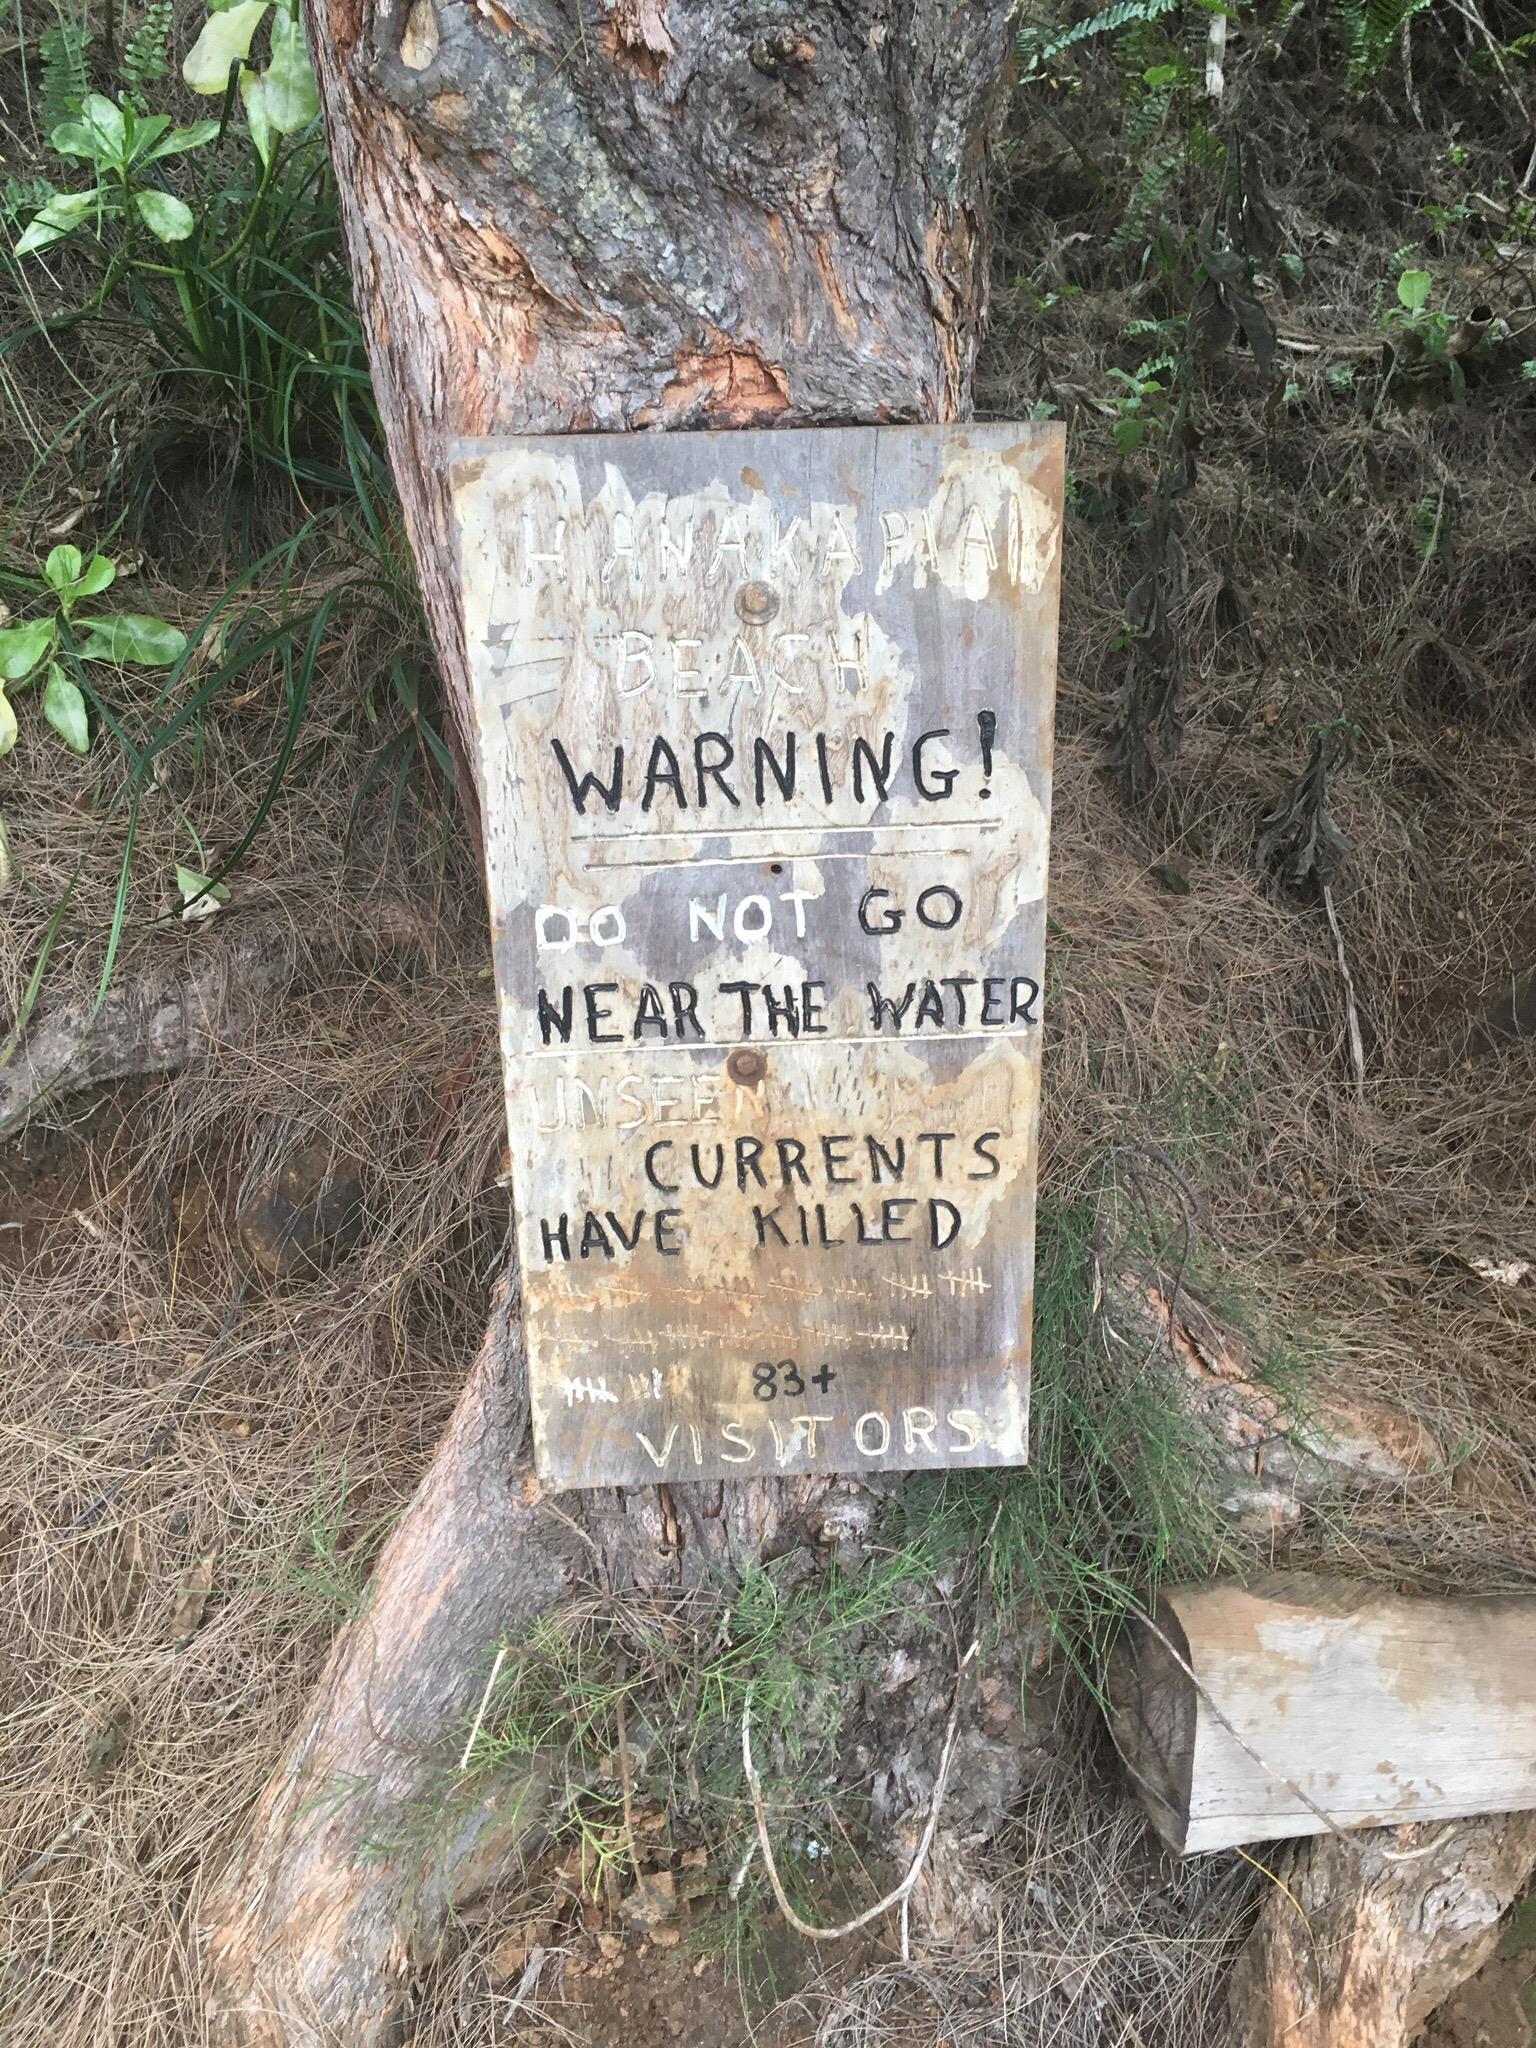 basically, do not go near the water at hanakapiai beach